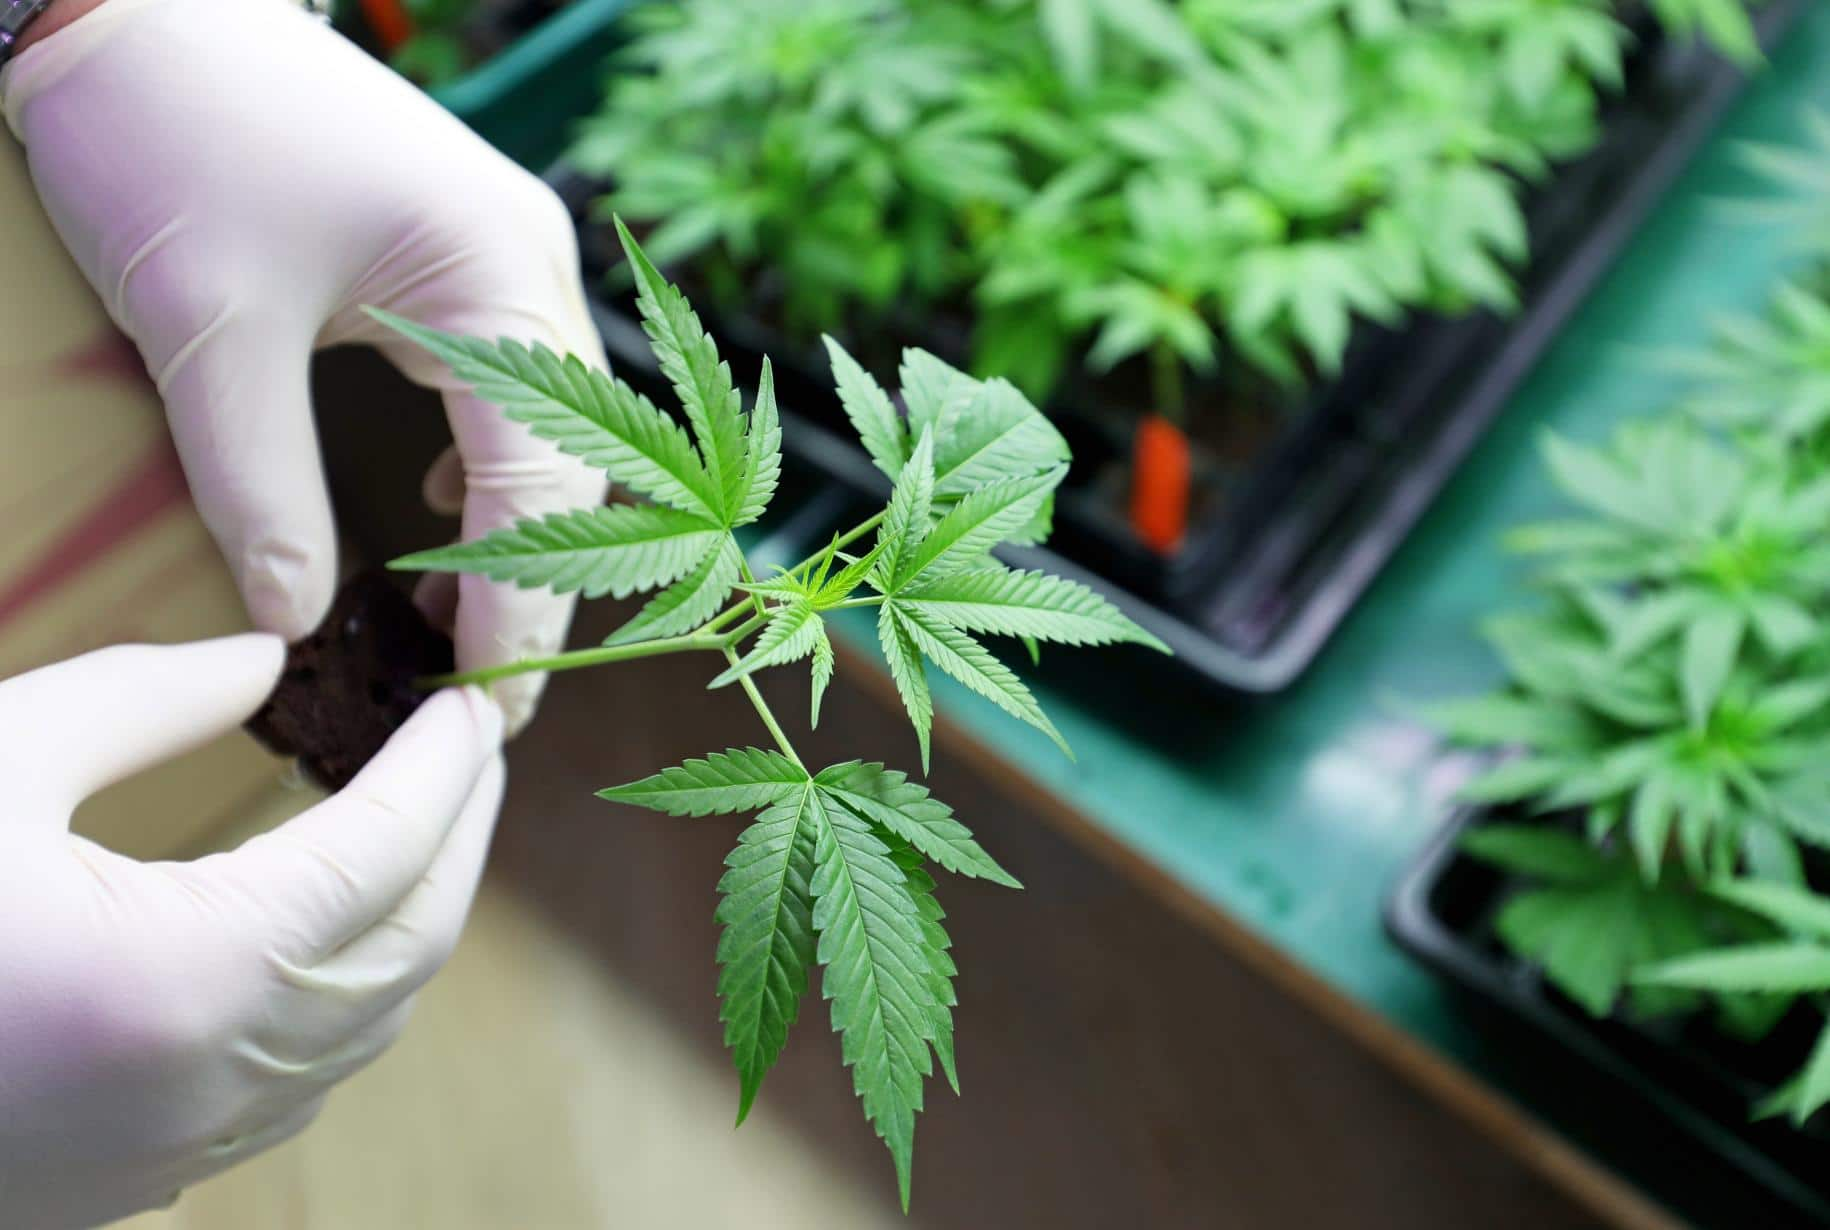 Medical marijuana producer hopes to expand into recreational market